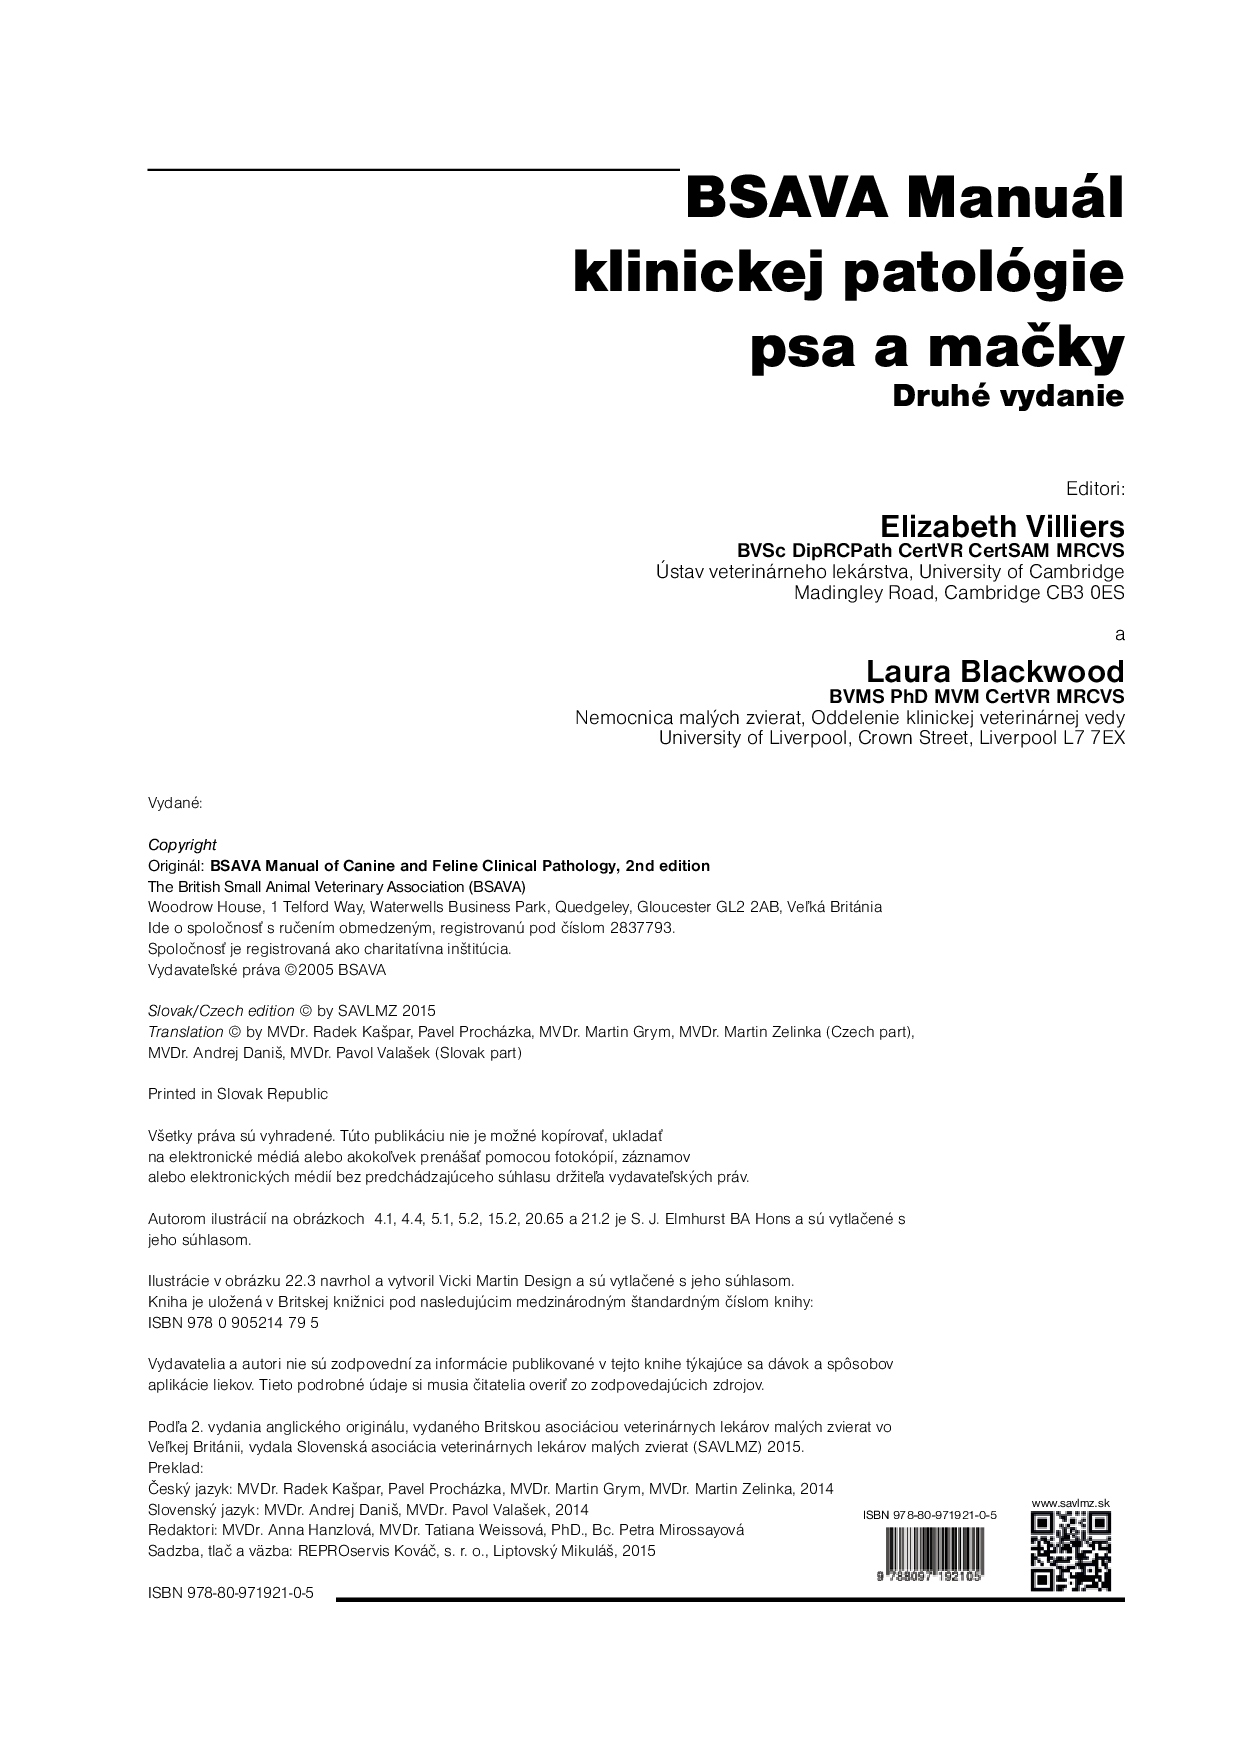 kroky do prazdna czech edition